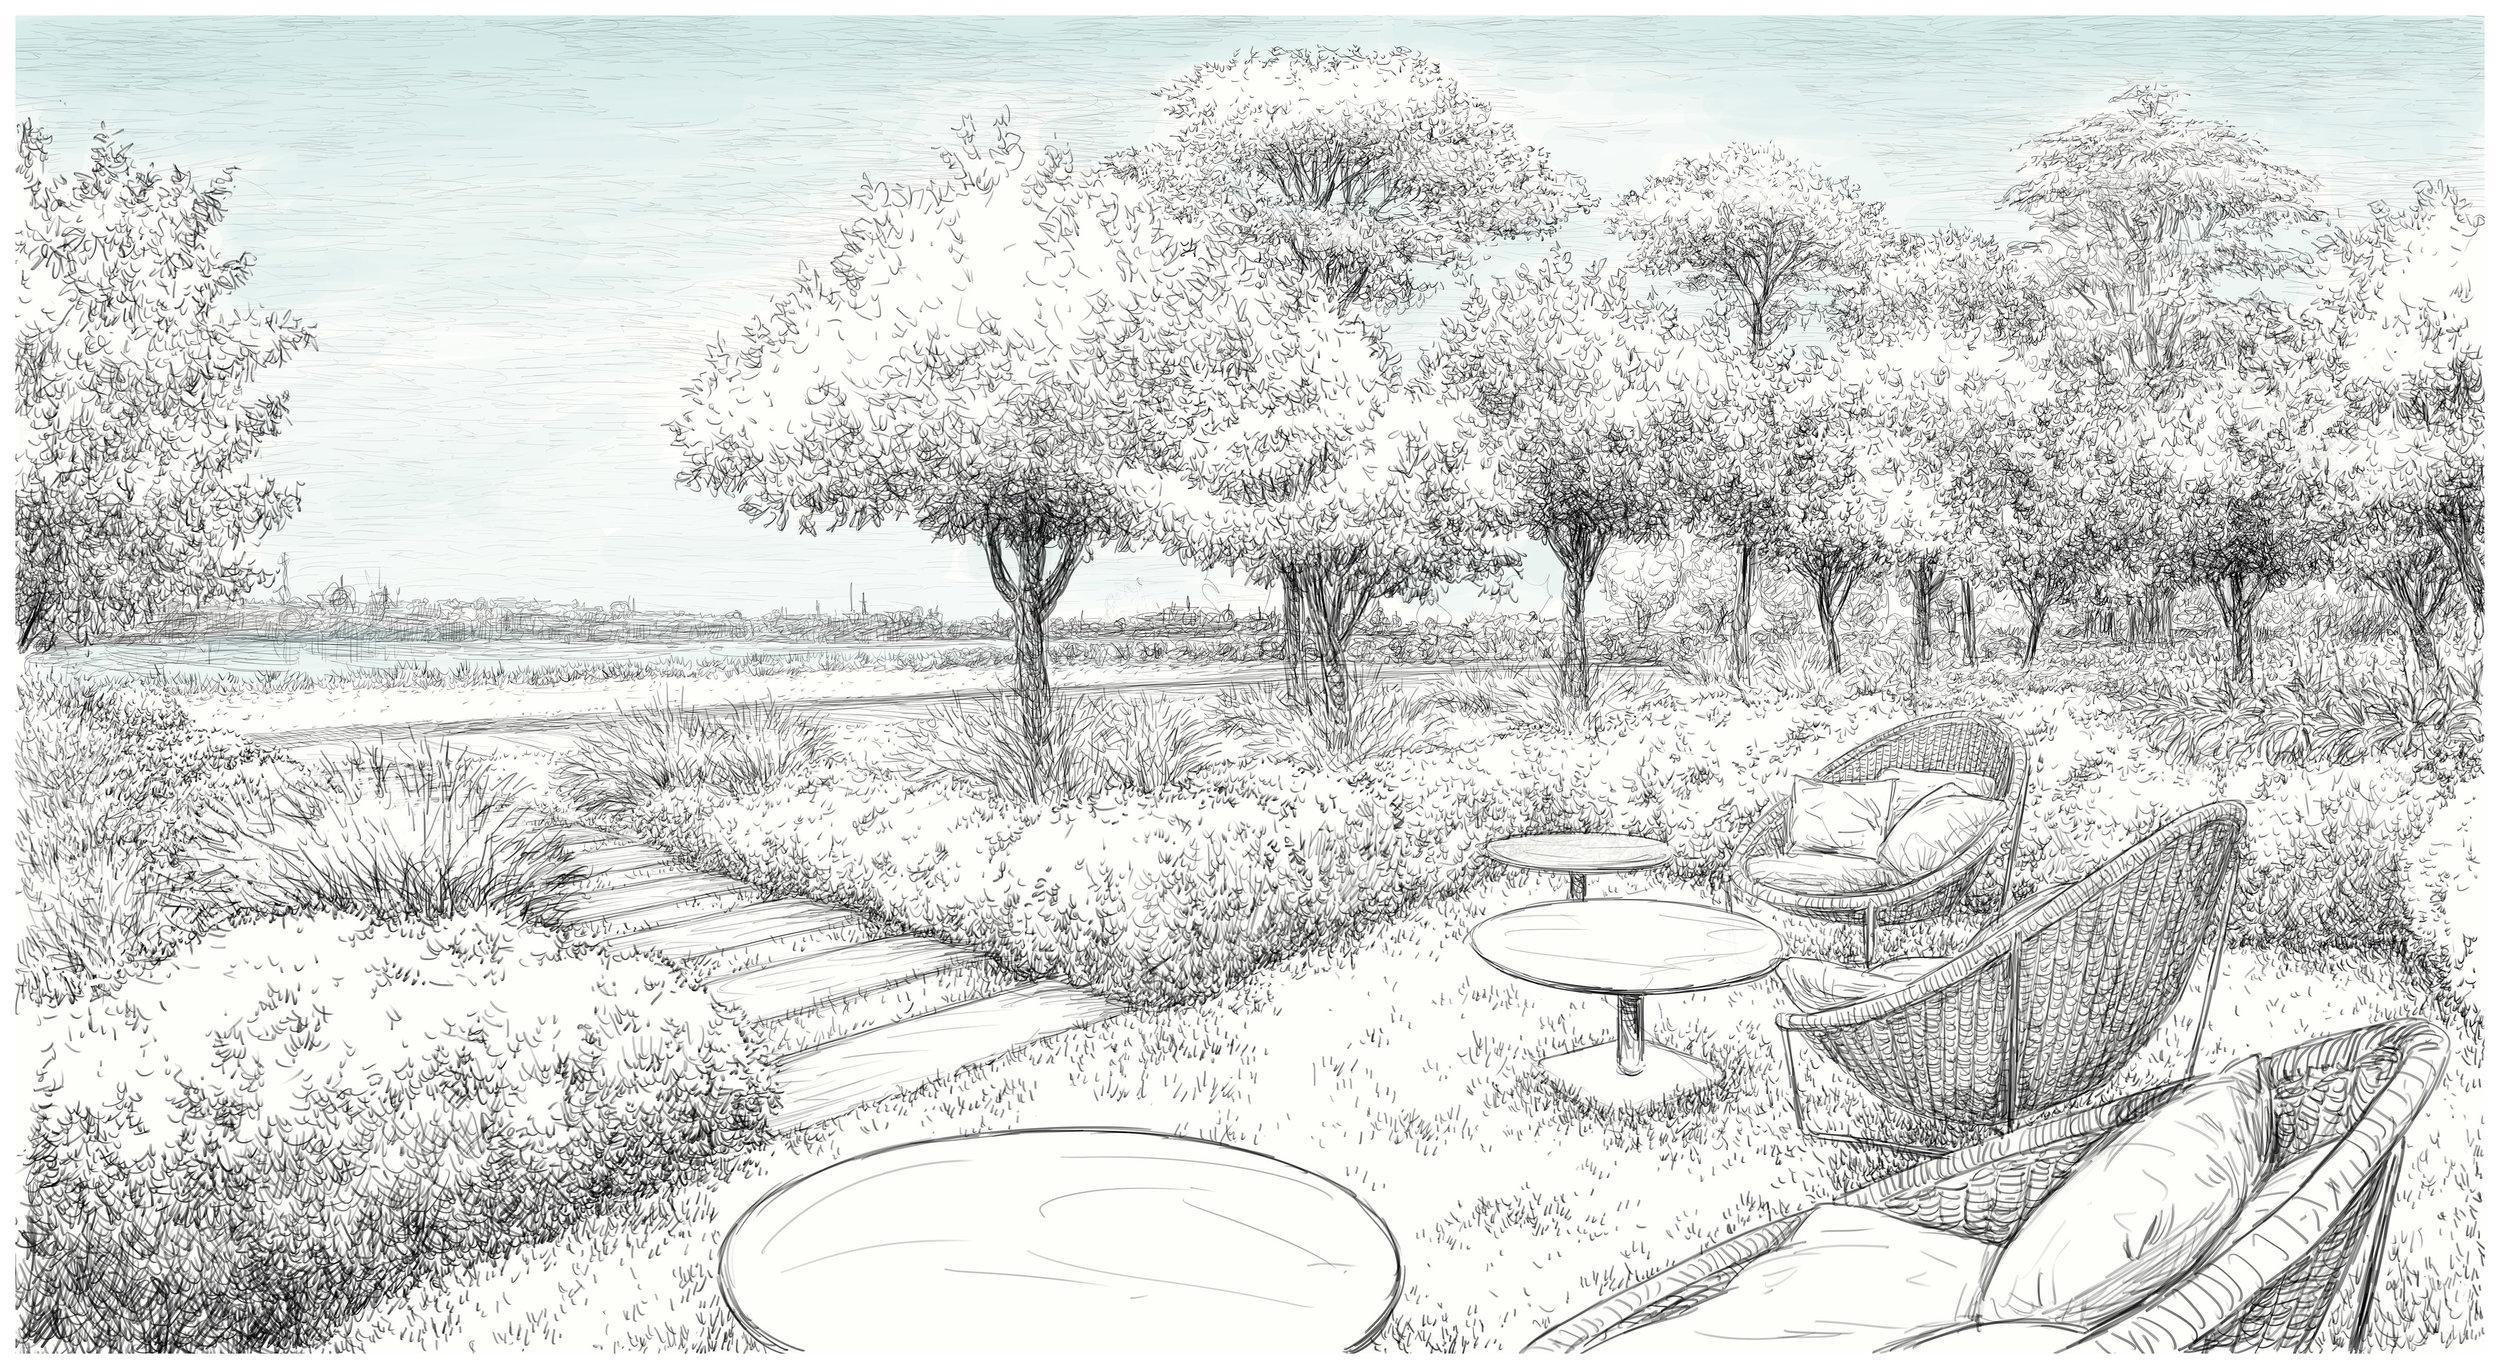 groundfloor garden space (drawn by massimo milano / enea landscape architecture)